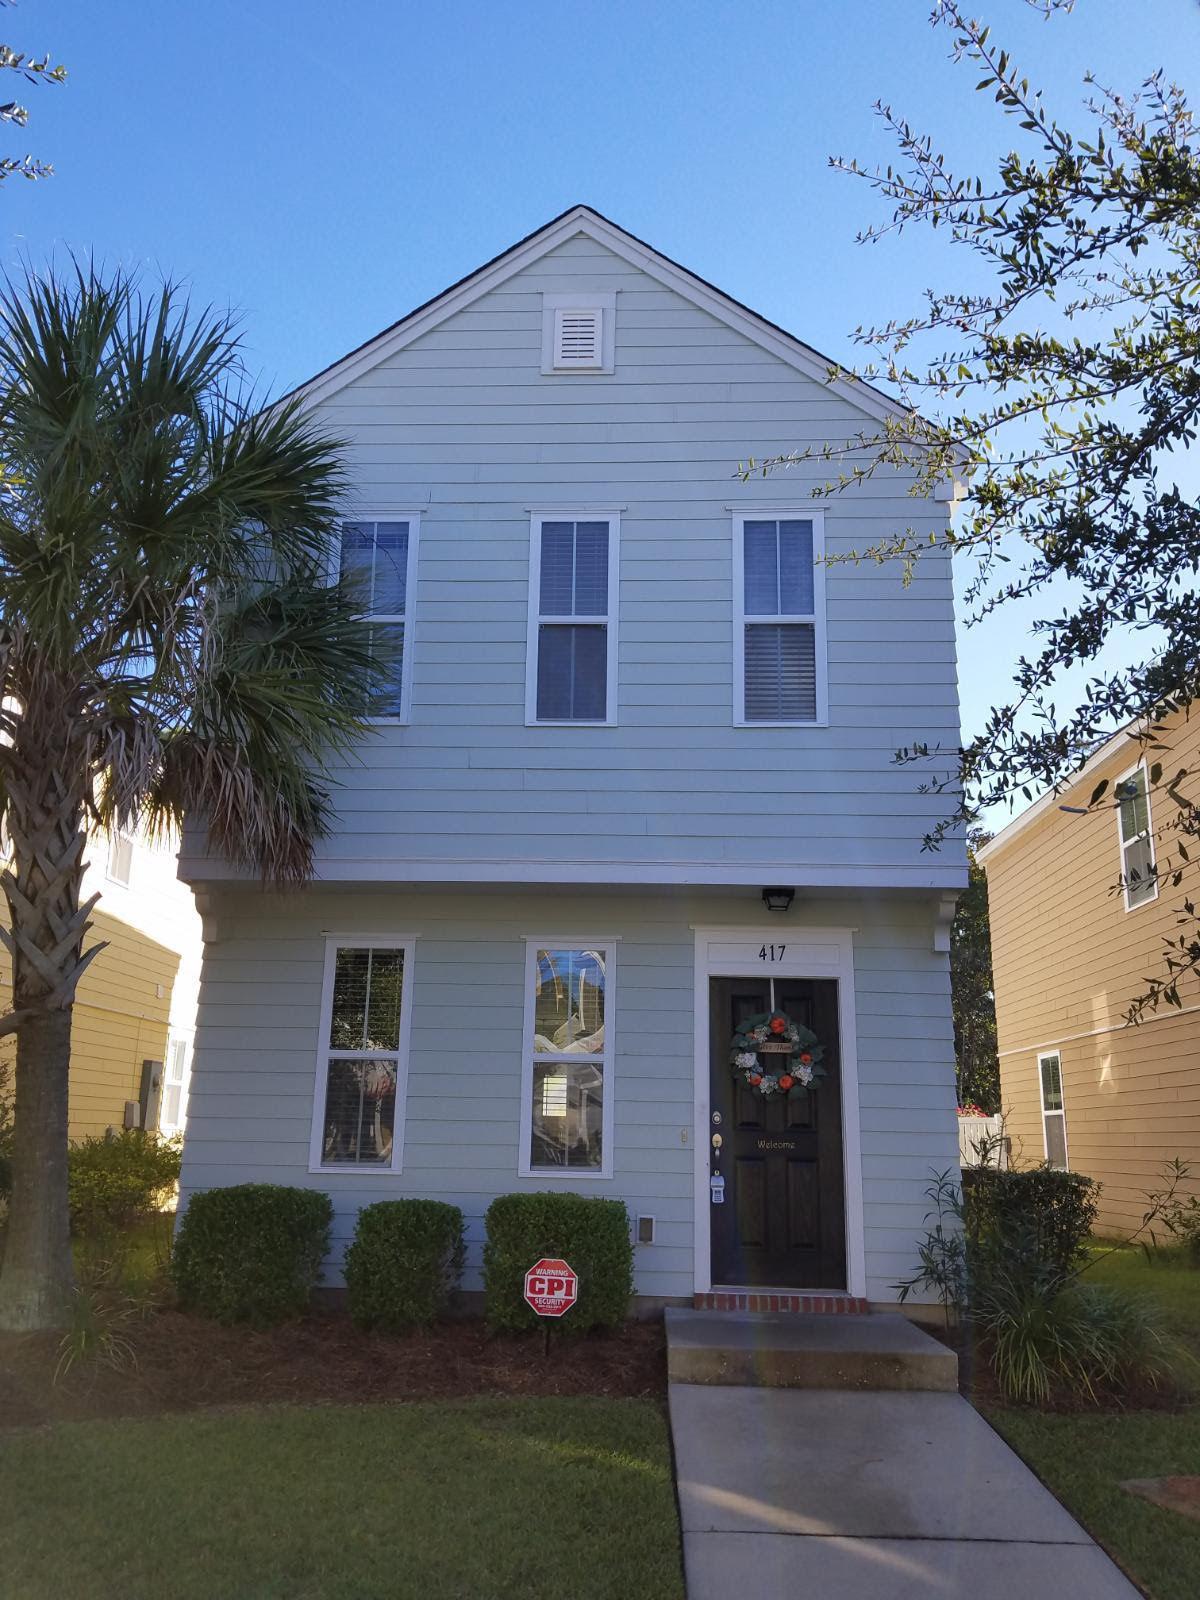 White Gables Homes For Sale - 417 Verbena, Summerville, SC - 0